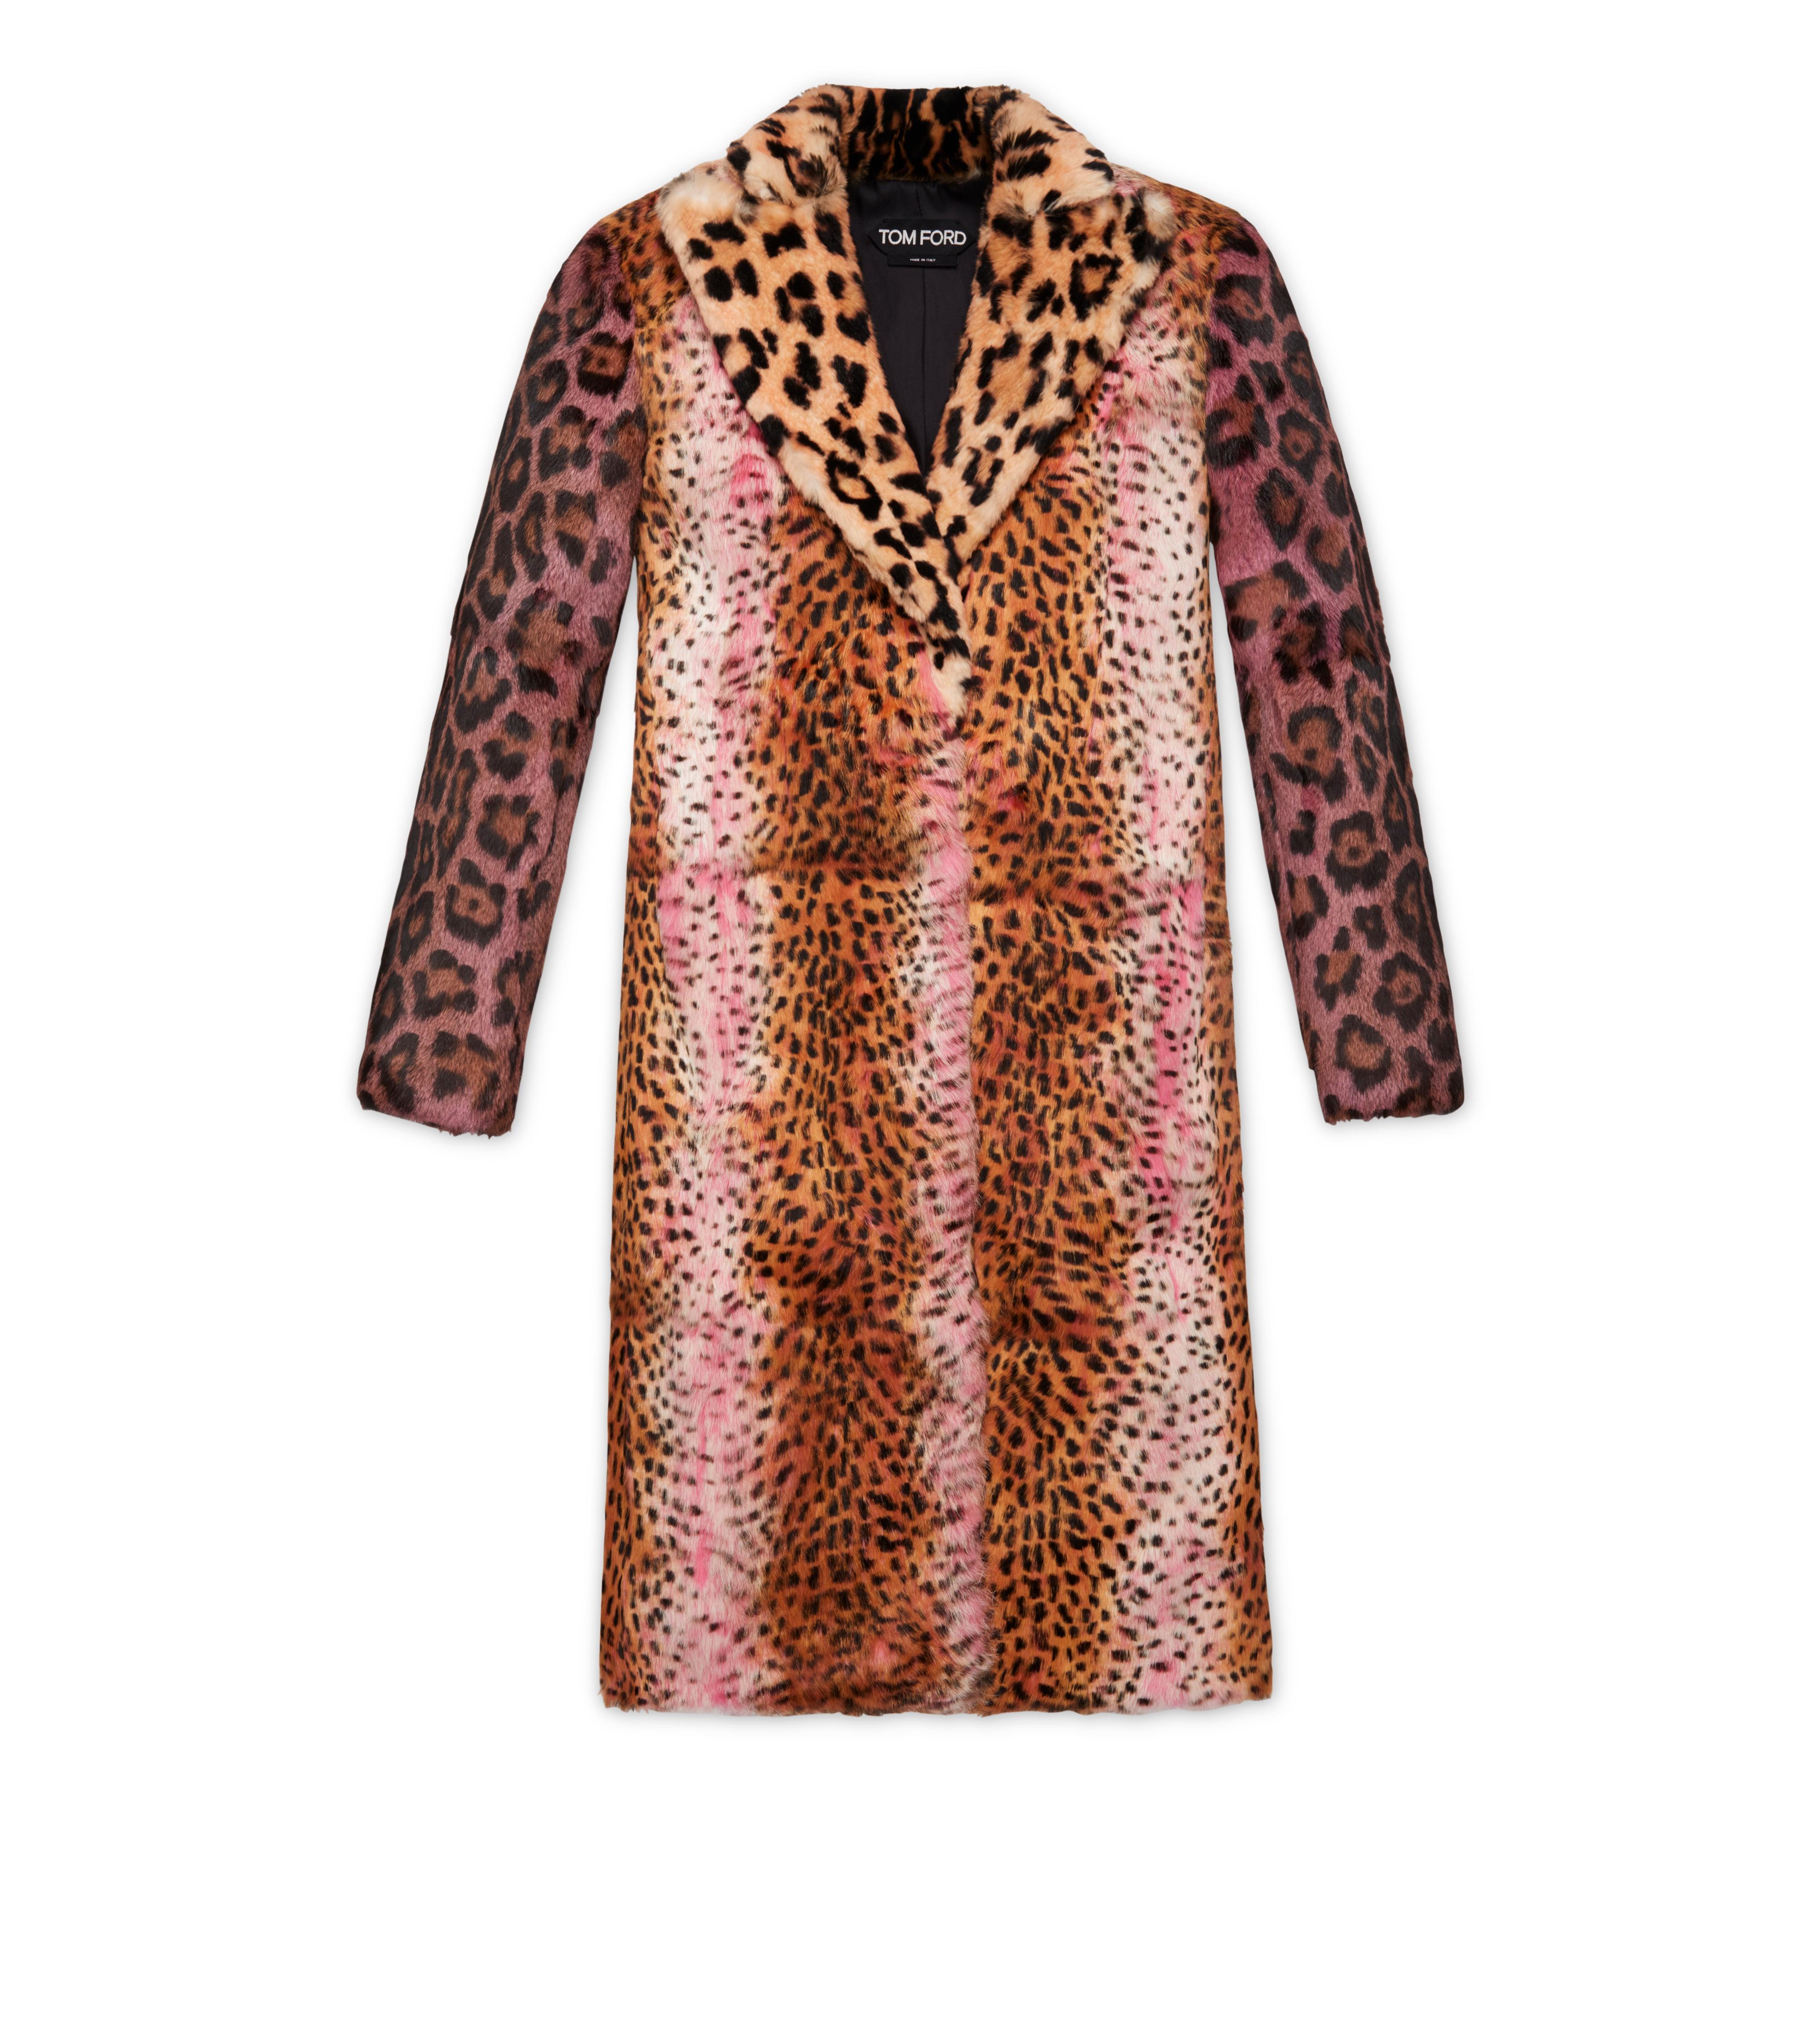 Strong-Shoulder Jaguar & Cheetah Patch Rabbit-Fur Coat Tom Ford